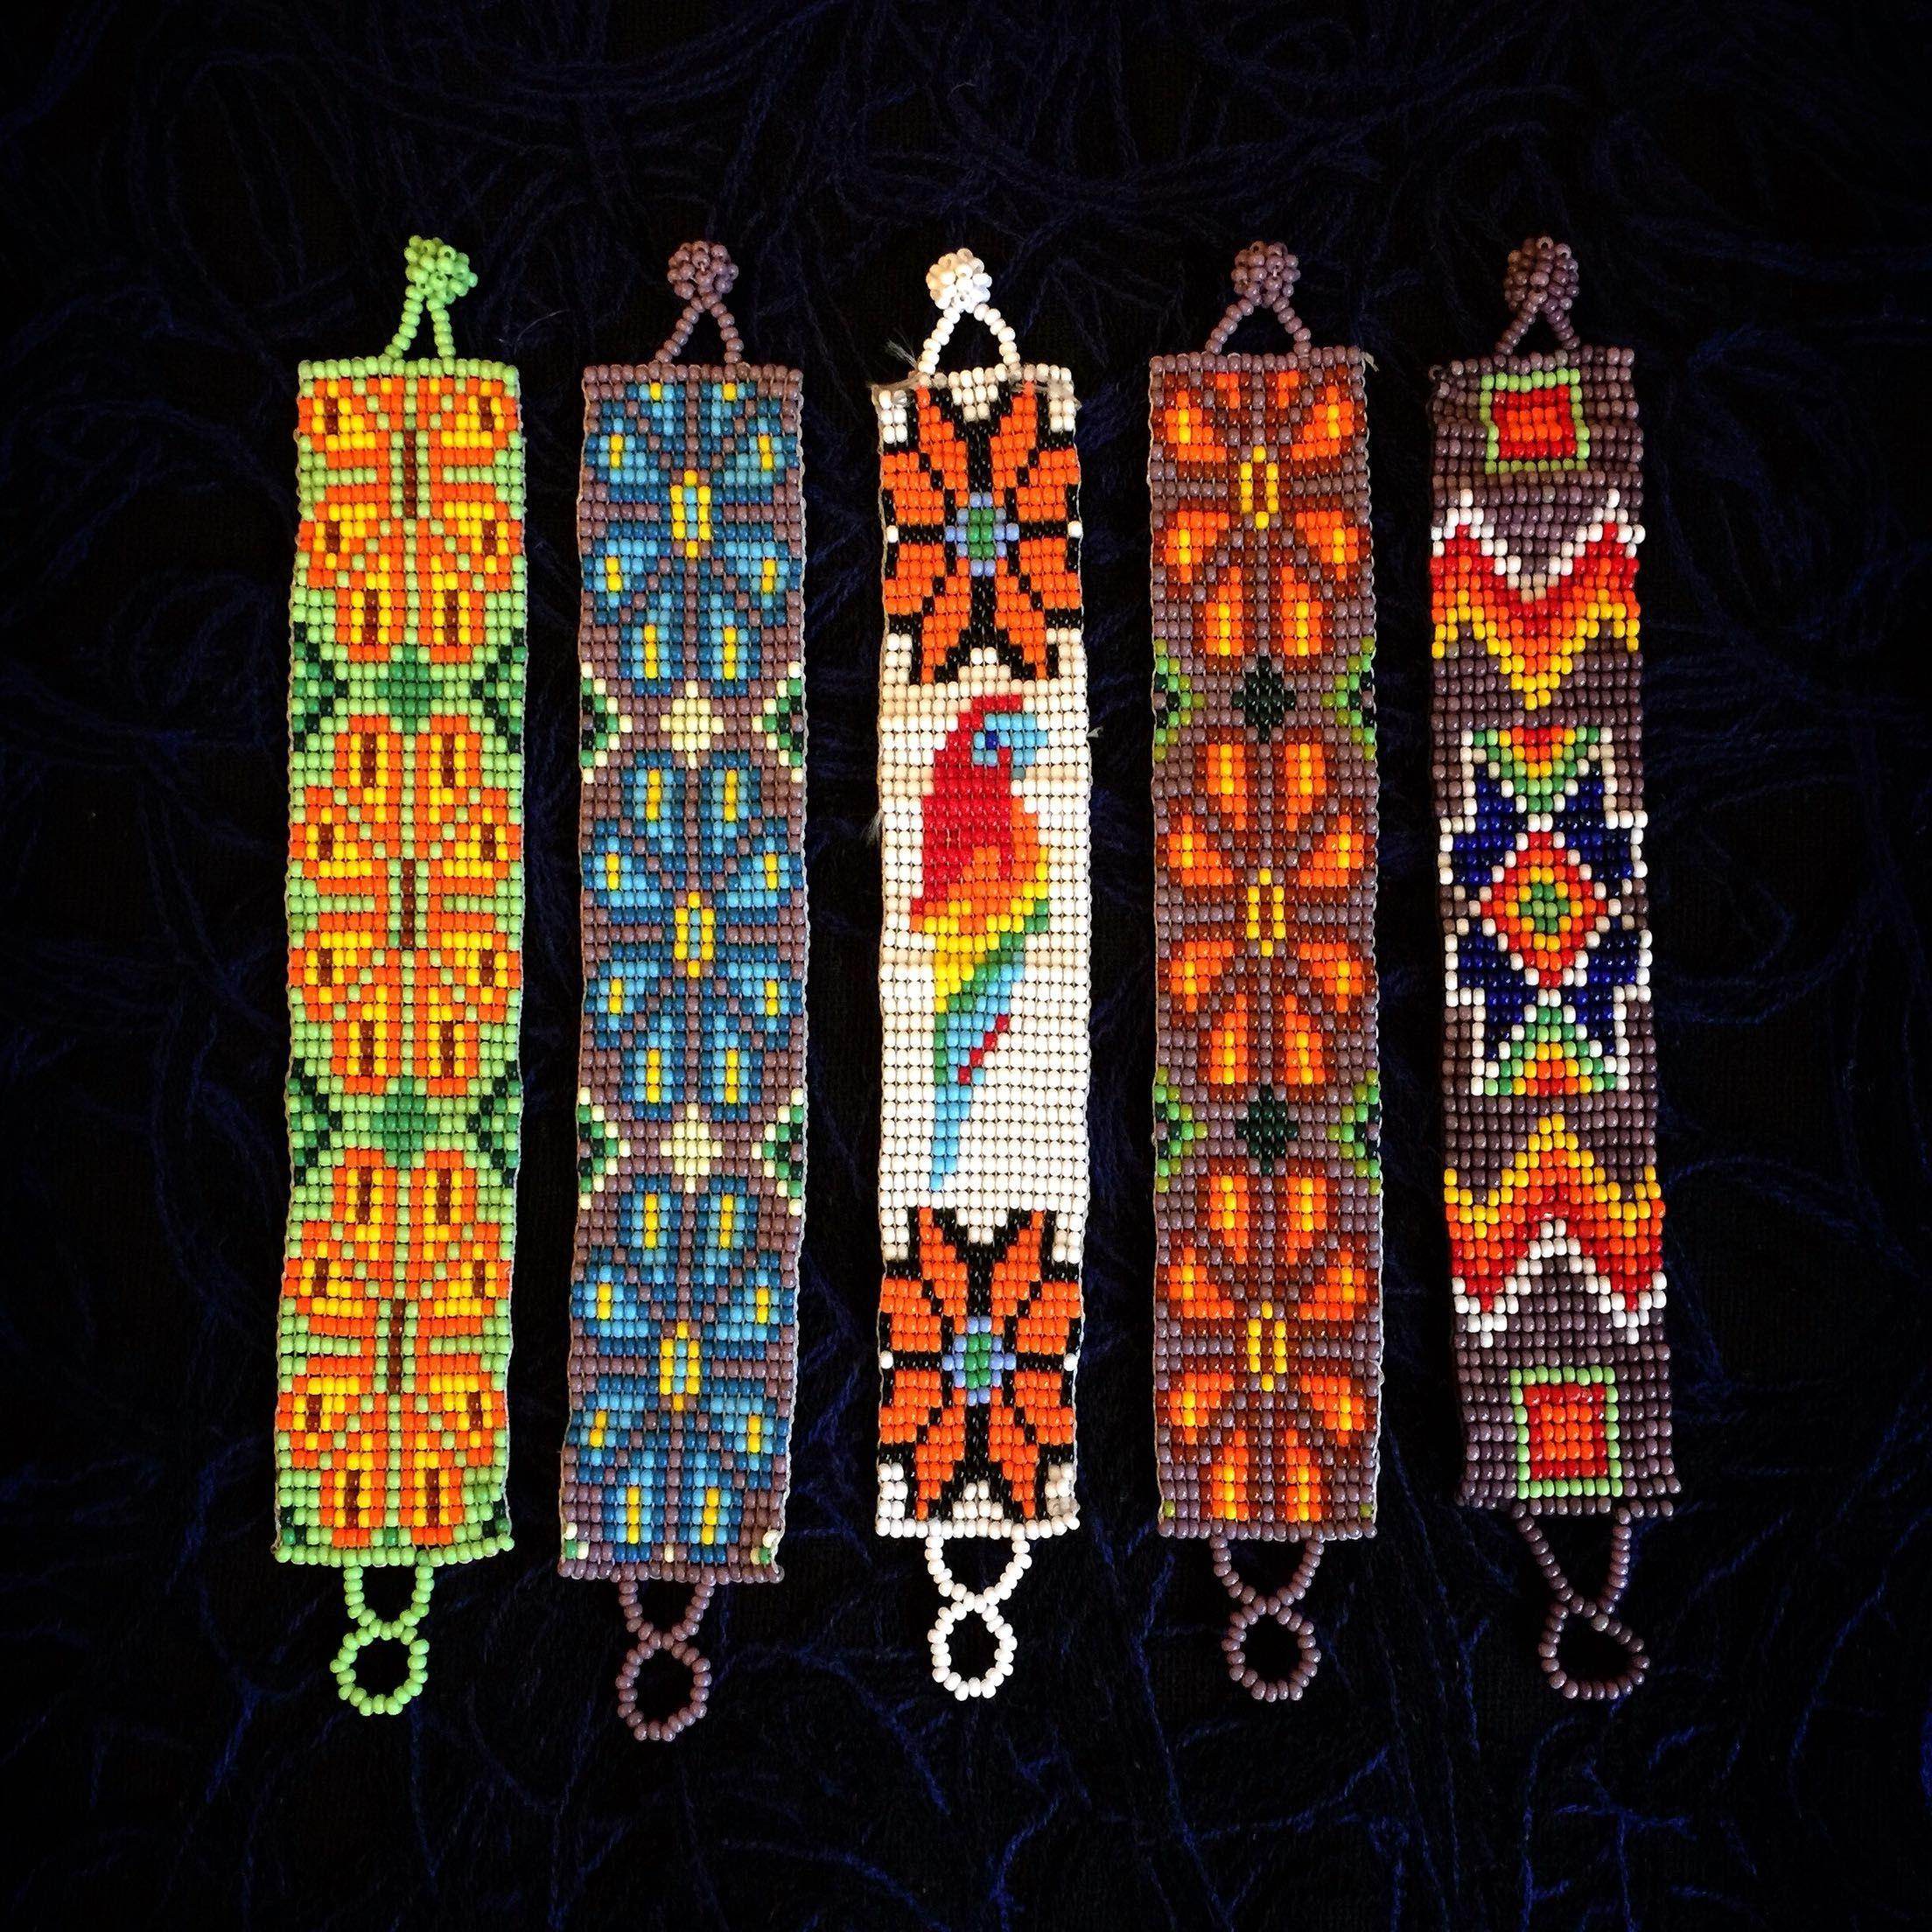 國內現貨 墨西哥Huichol土著印第安手工串珠細版手鏈 五款-淘寶網全球站 | Pulseras, Pulseras de chaquira y Pulseras y ...